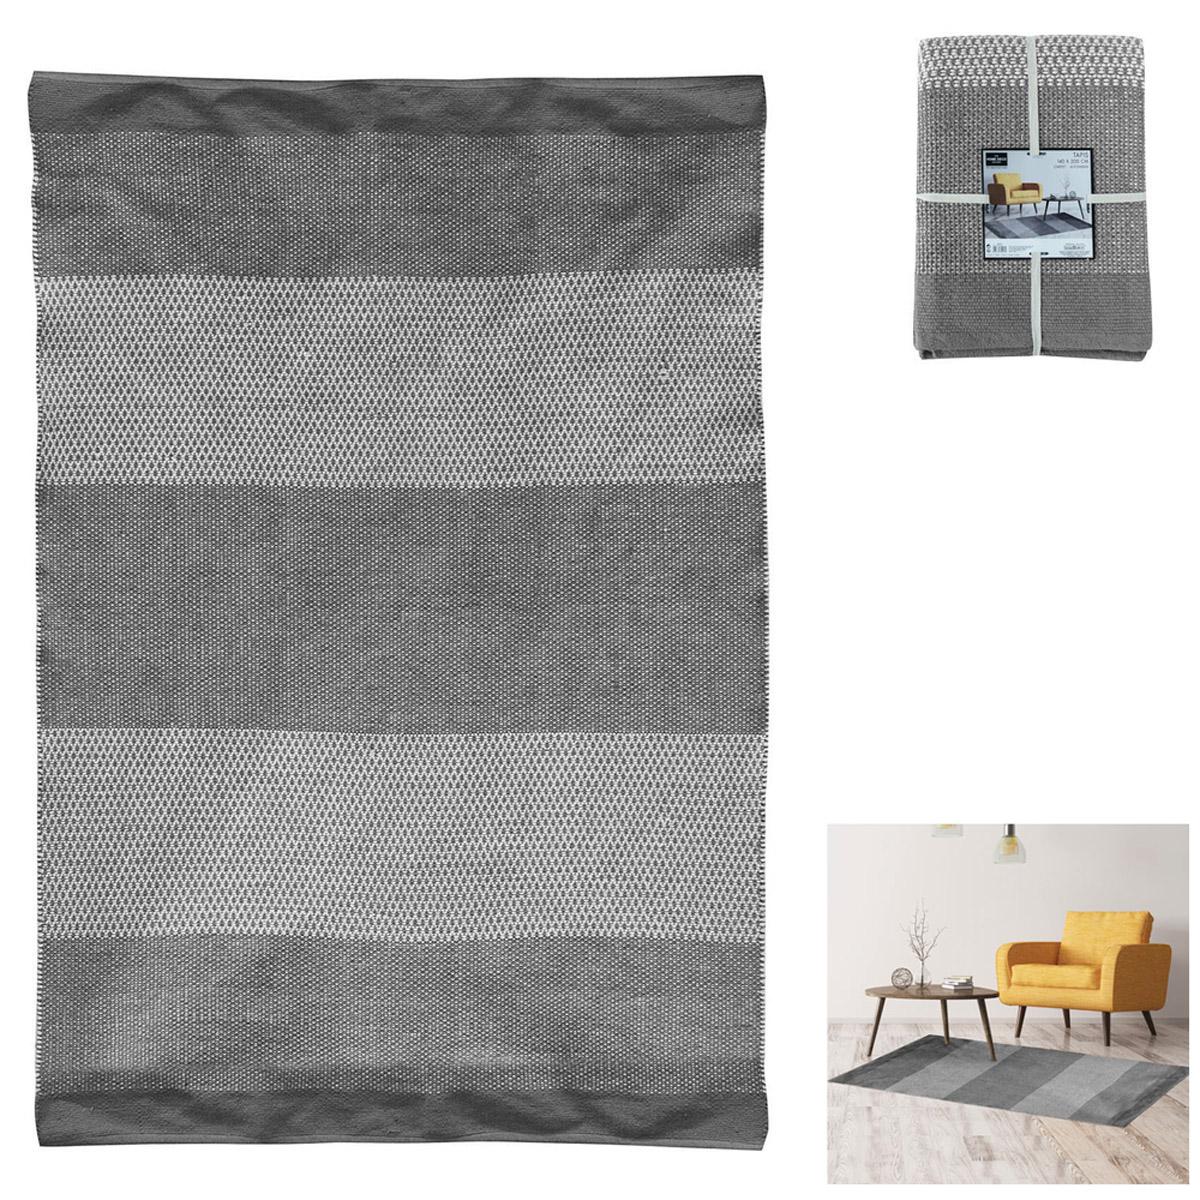 Tapis coton \'Boho\' gris - 200x140 cm - [R2490]